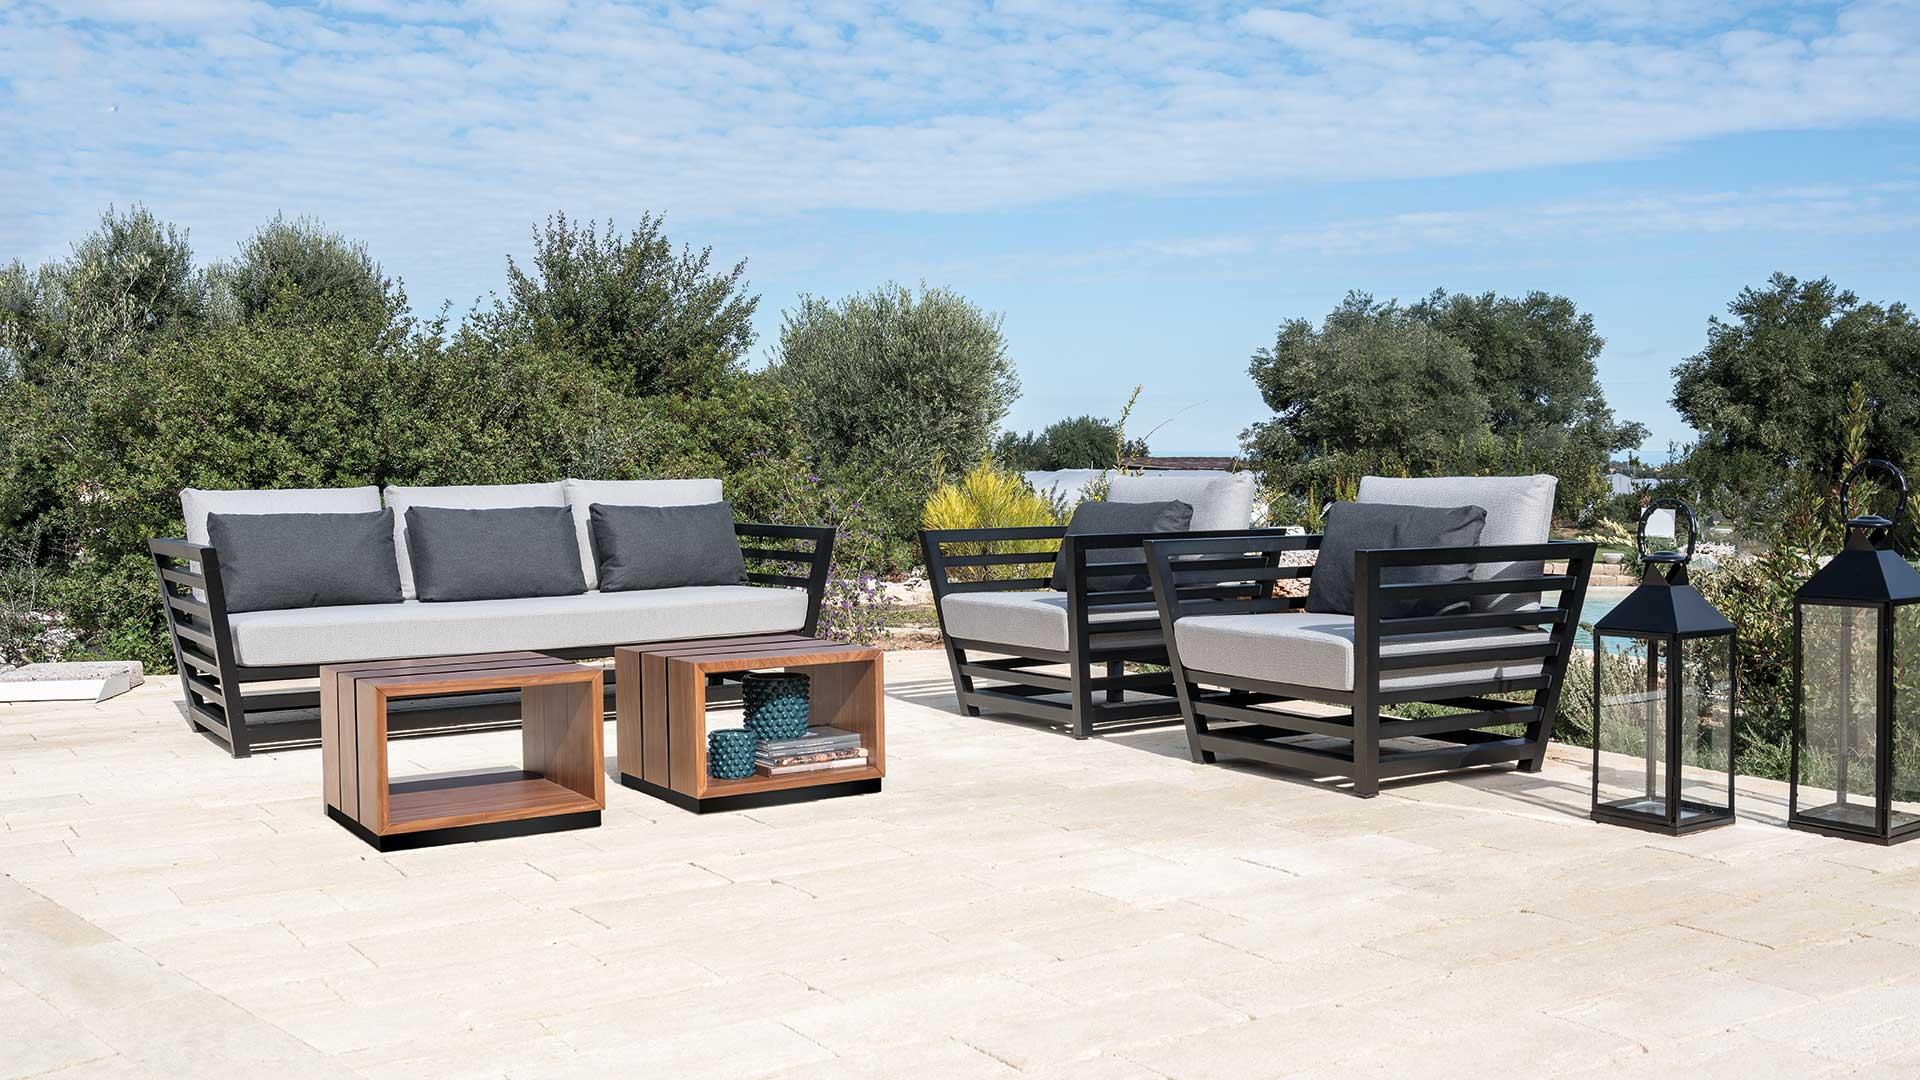 Arredo giardino moderno tendenze per l 39 arredamento - Happy casa arredo giardino ...